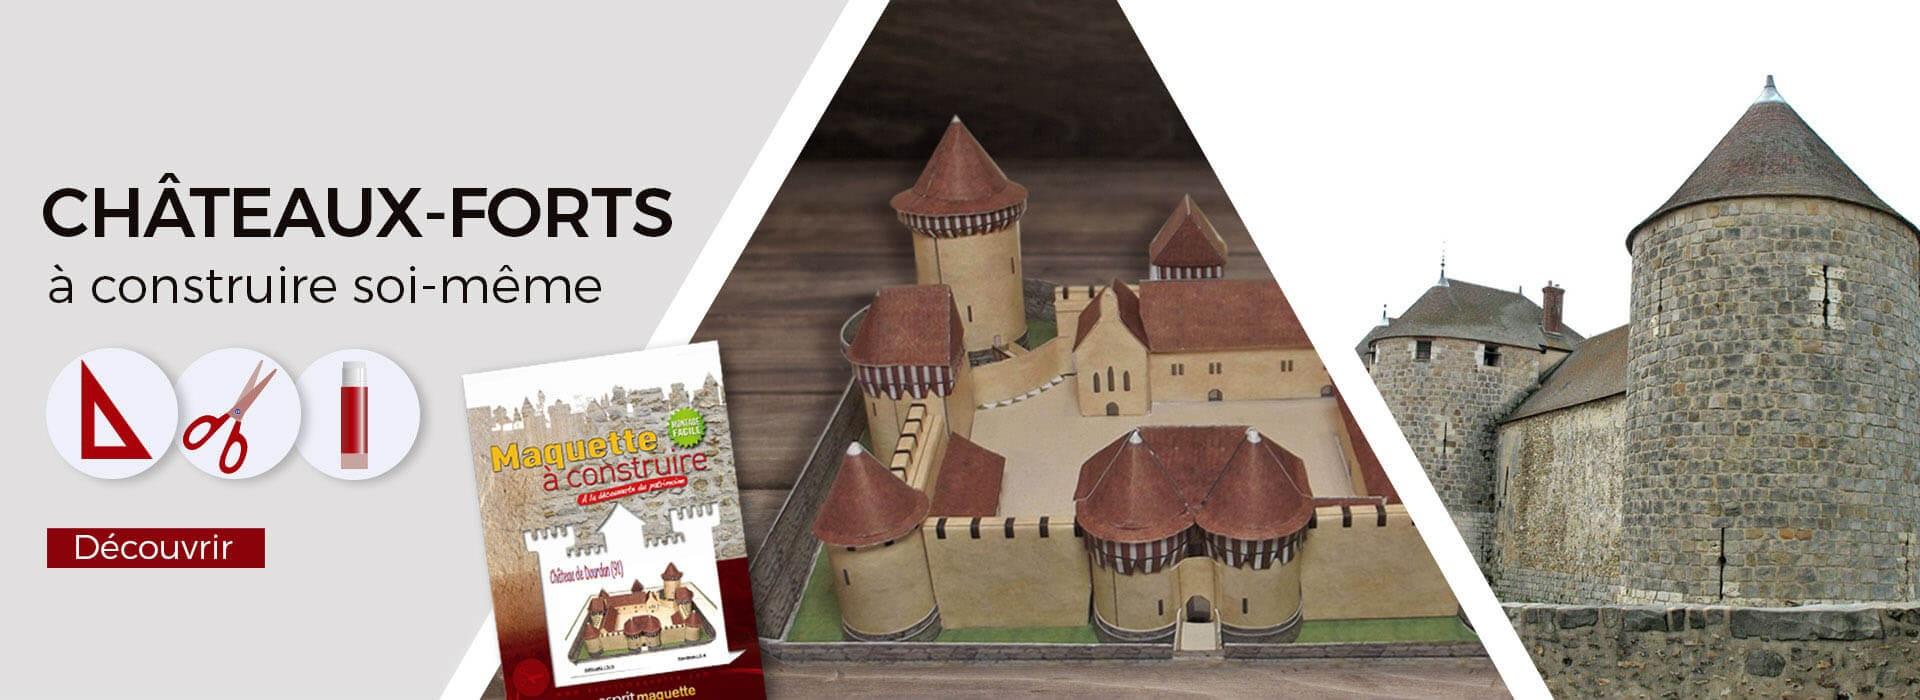 Maquettes Châteaux Forts